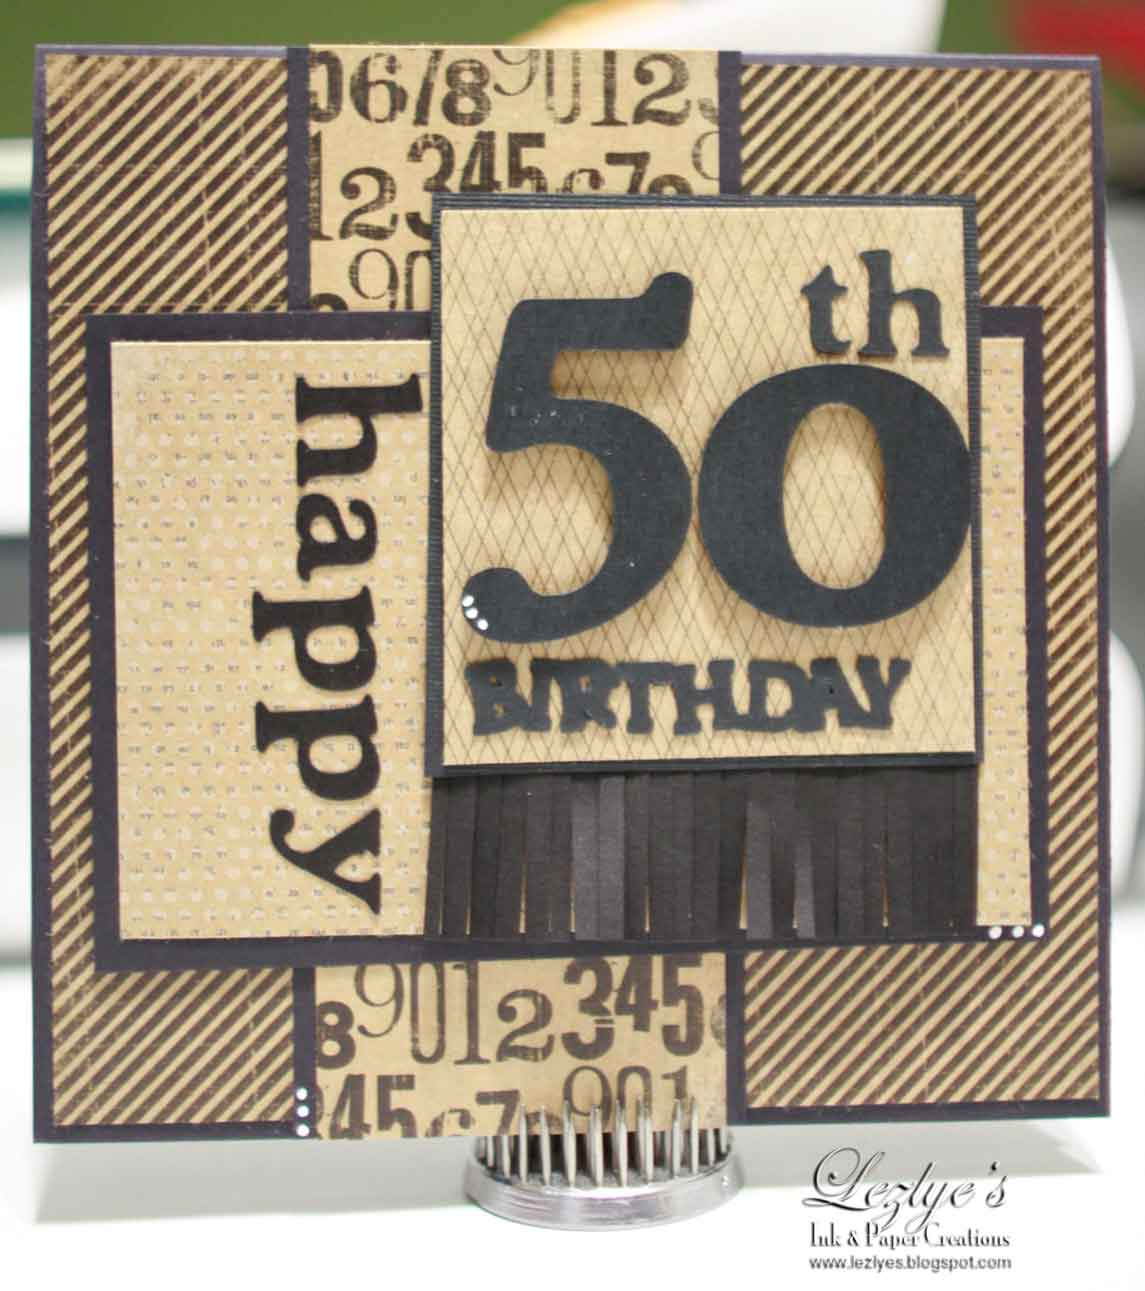 Lezlye Lauterbach, Designs: 50th Male Birthday Card-Shop